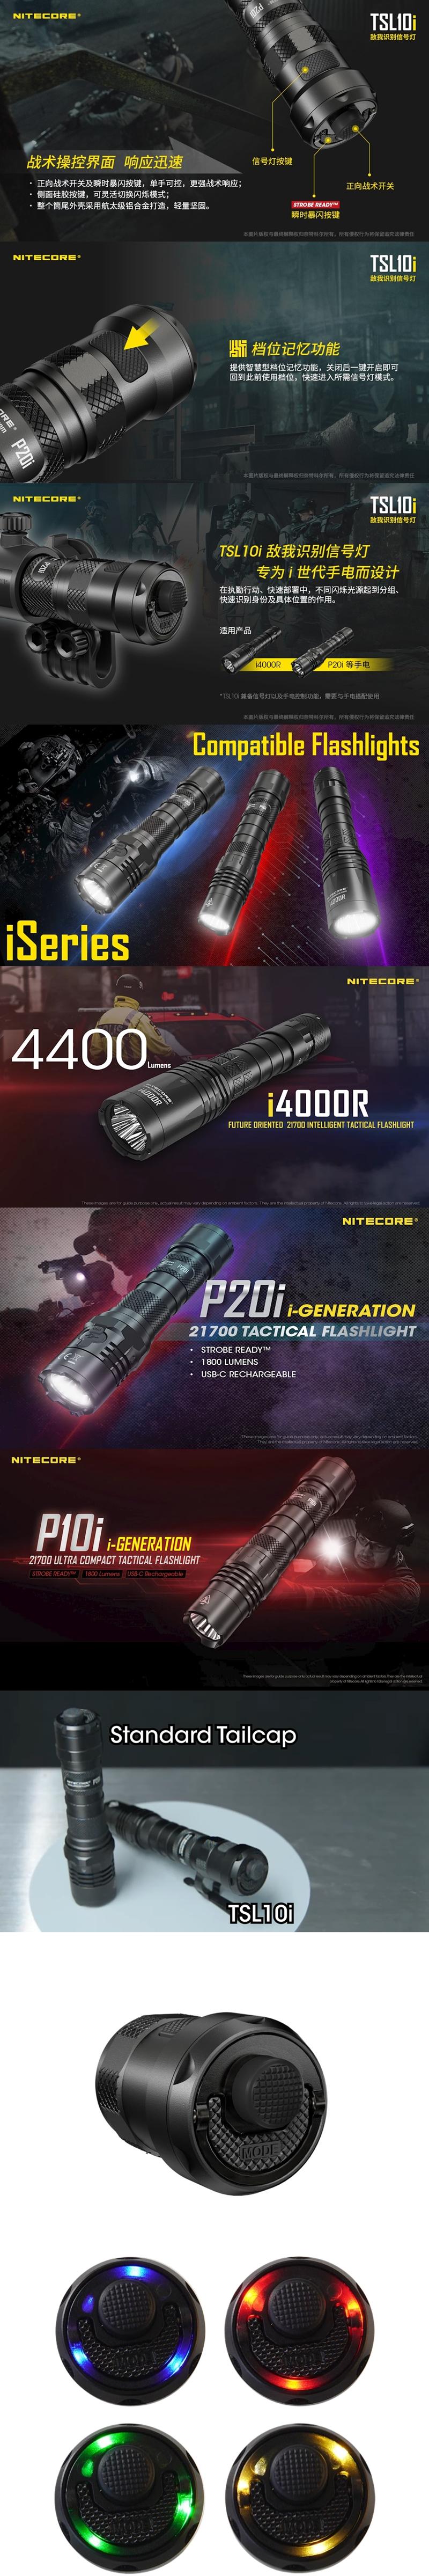 Nitecore TSL10i 多光源 紅光 白光 藍光 綠光 警示燈 尾蓋 識別信號燈 tail cap signal light  適用 i4000R P20i 戰術手電筒